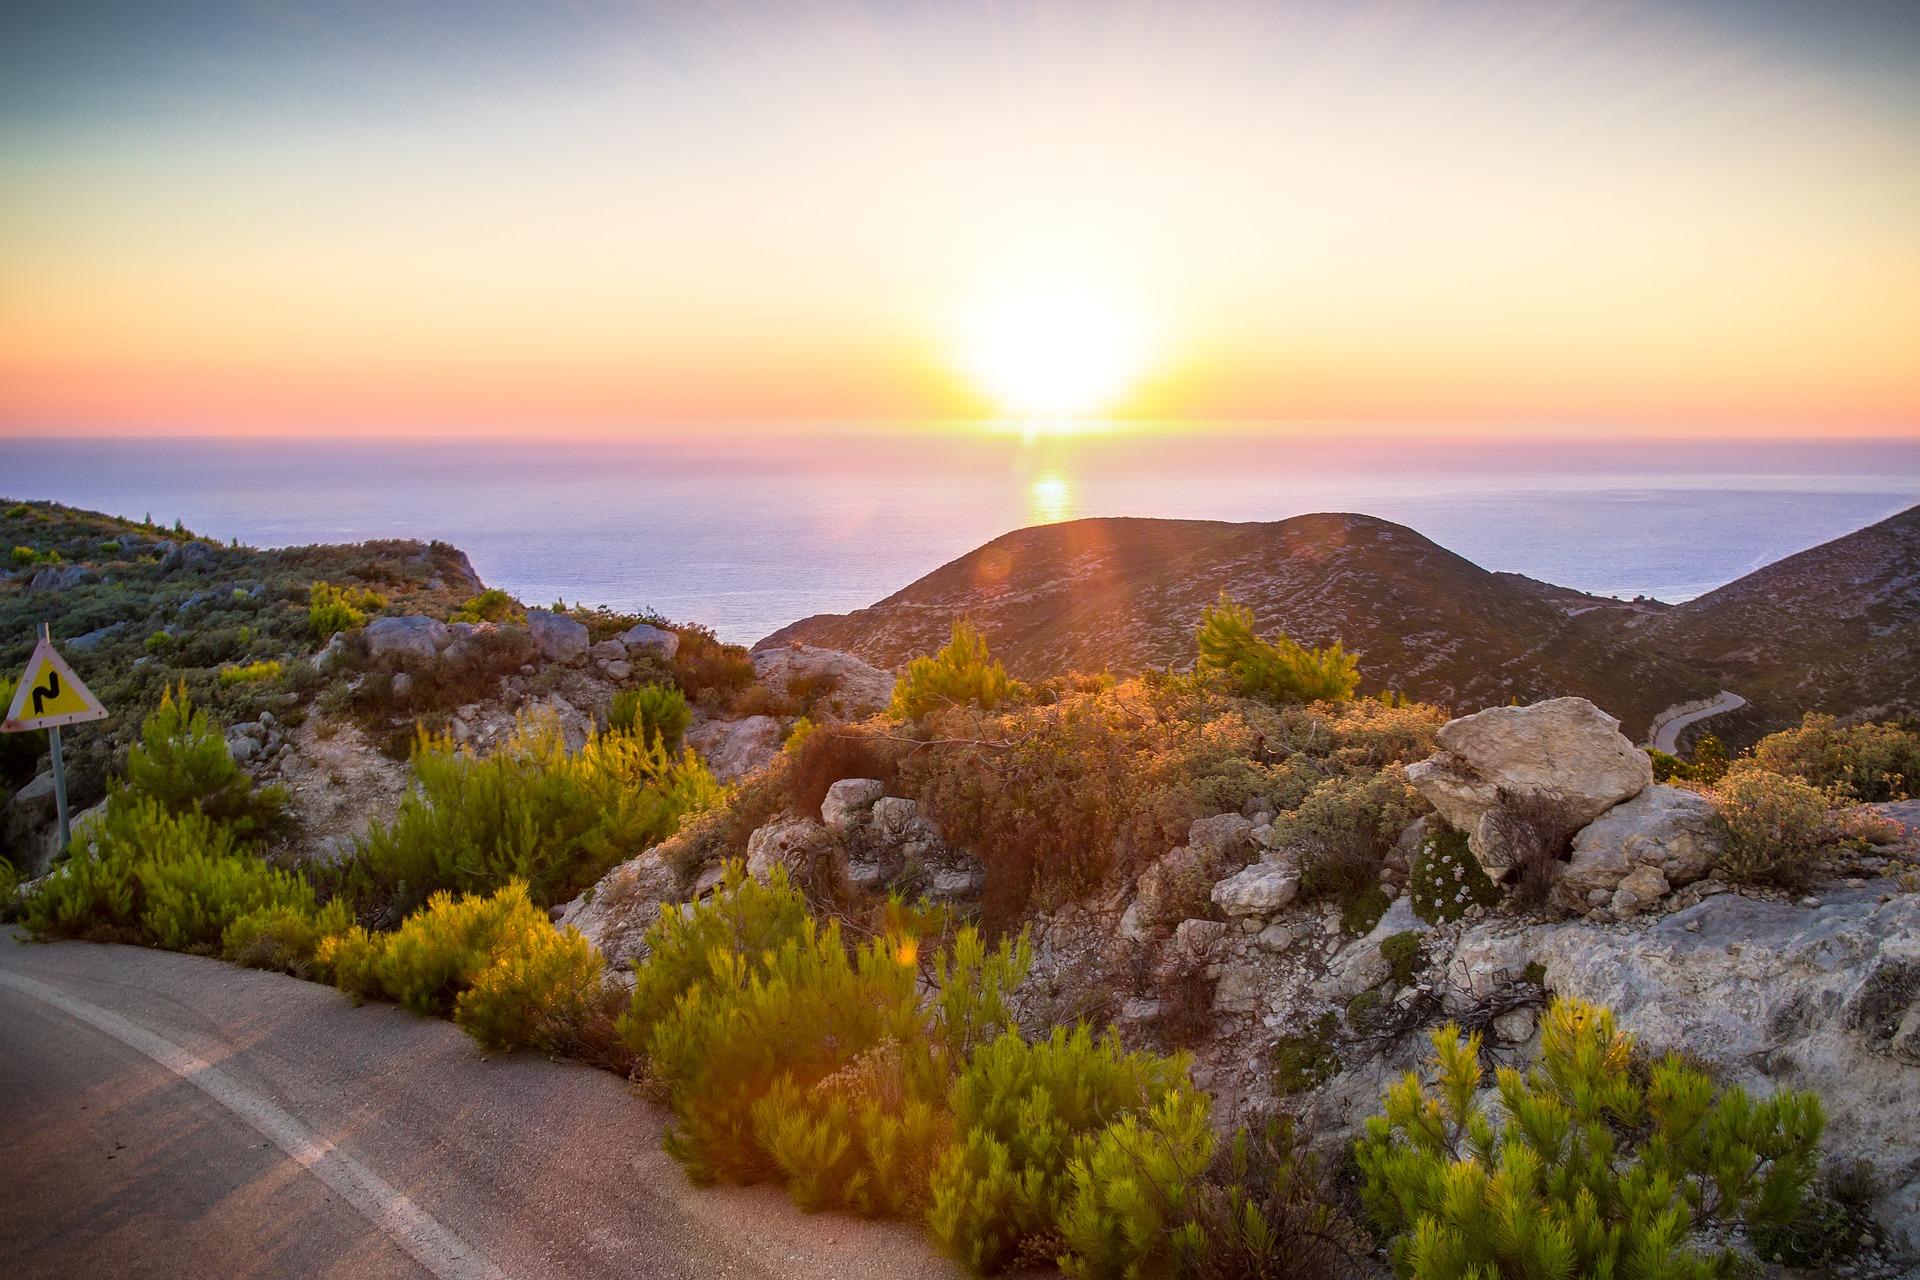 Keri - Leuchtturm mit Sonnenuntergang